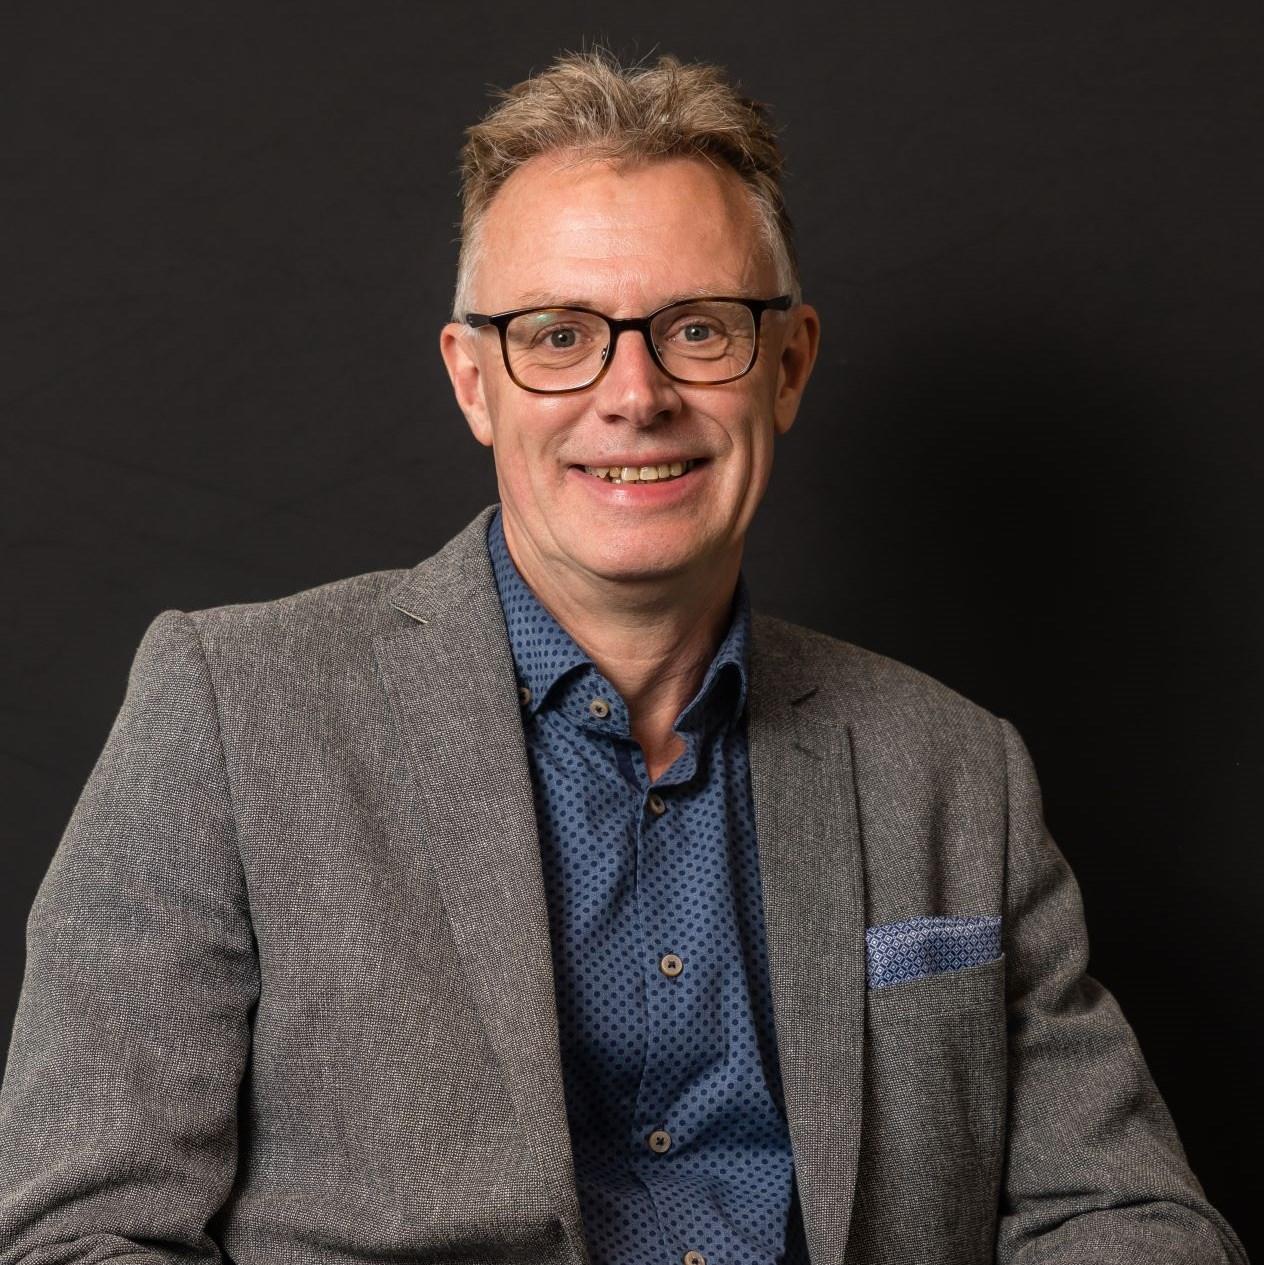 Foto van André Slomp